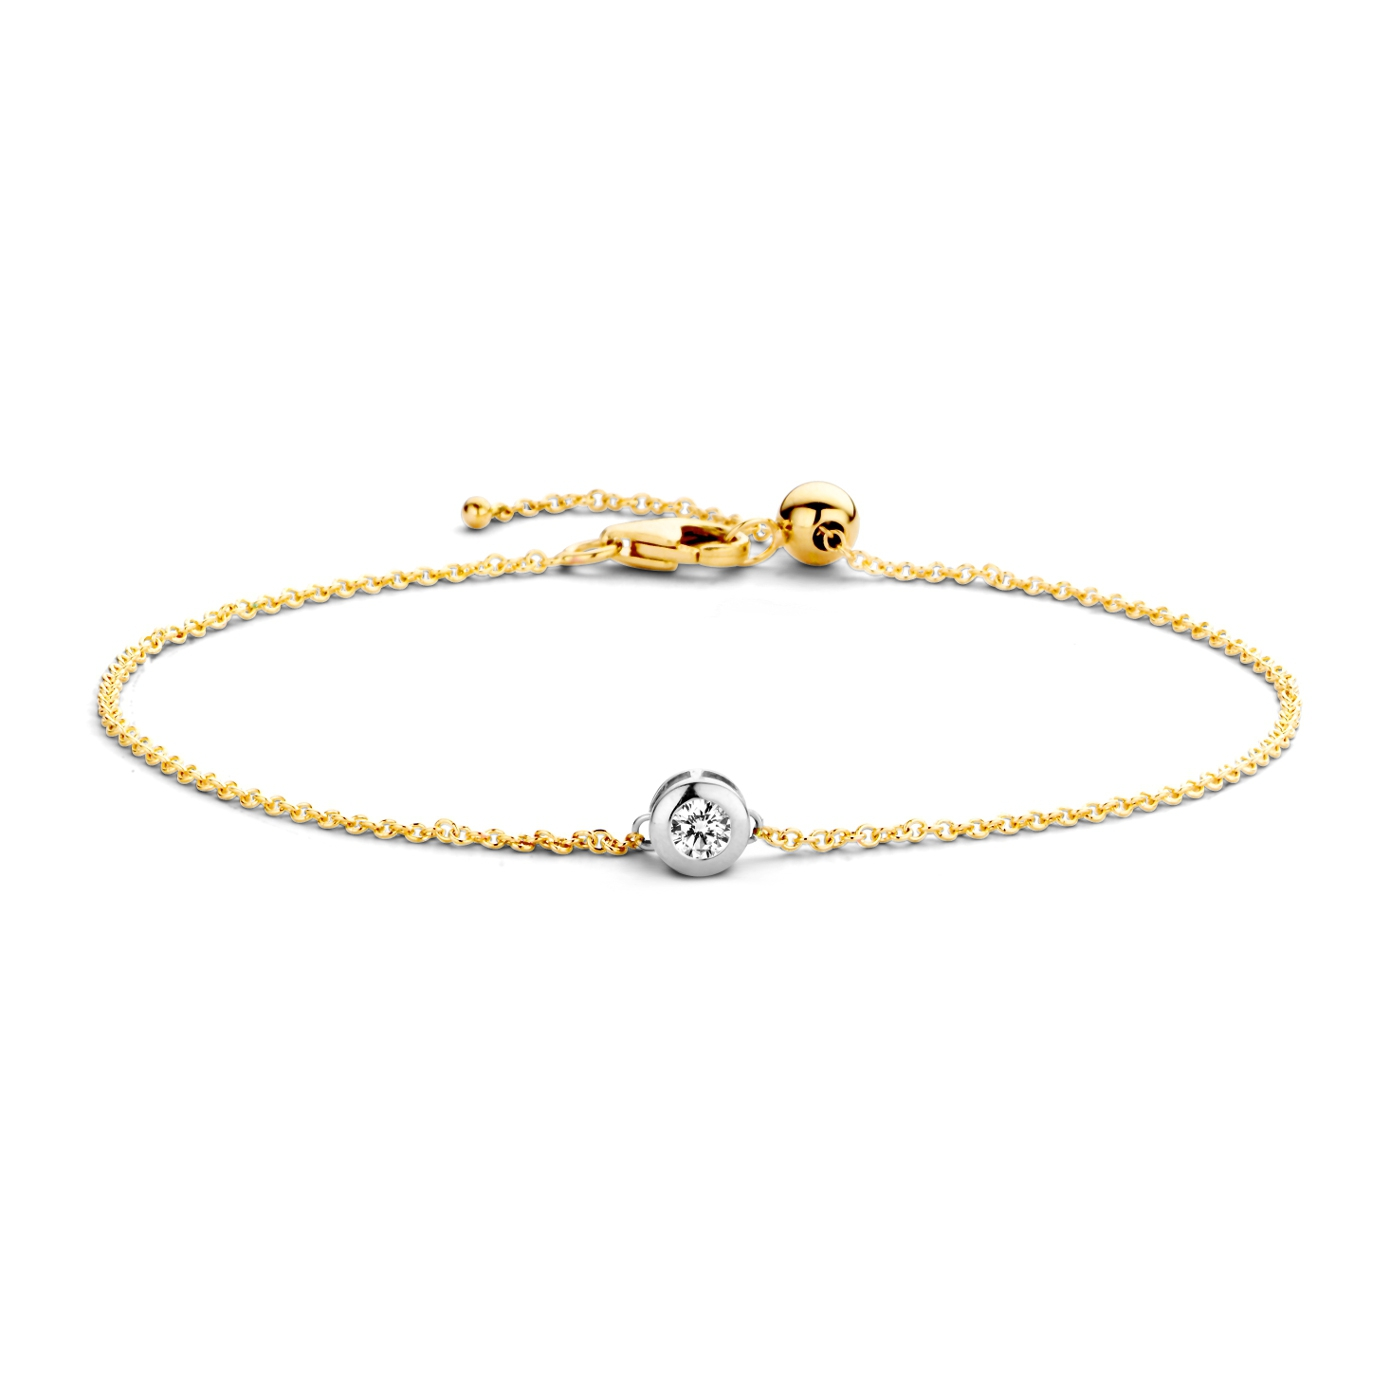 Afbeelding van Blush 14 Karaat Gouden Armband 2167BZI (Lengte: 18.00 cm)